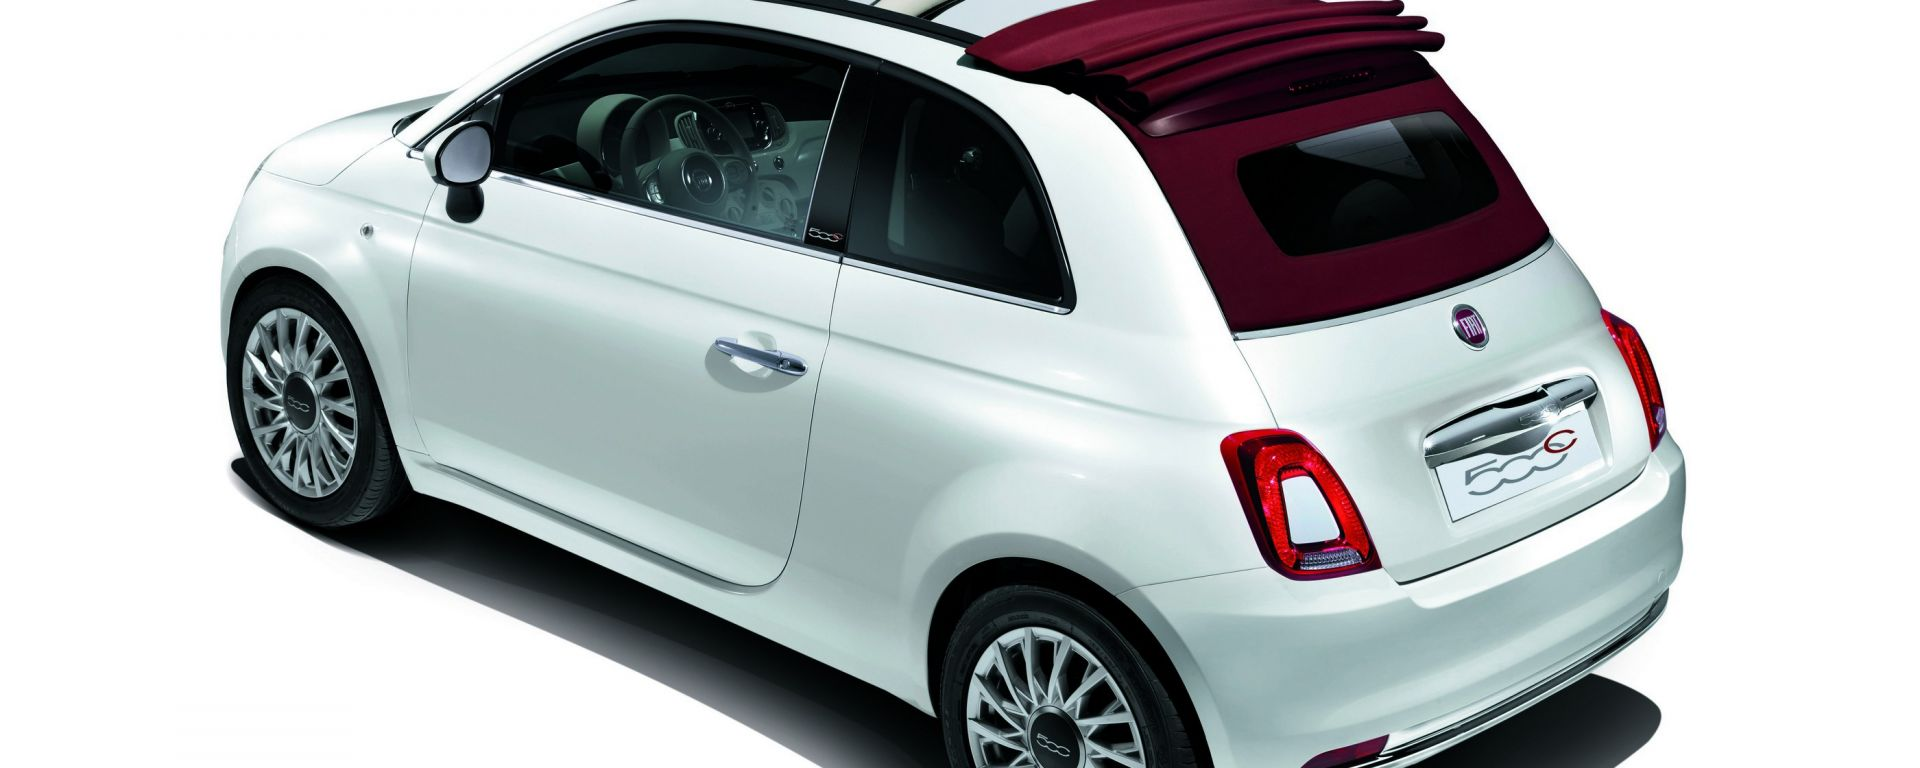 Fiat: Lady Gaga si aggiudica la 500C all'asta per amfAR